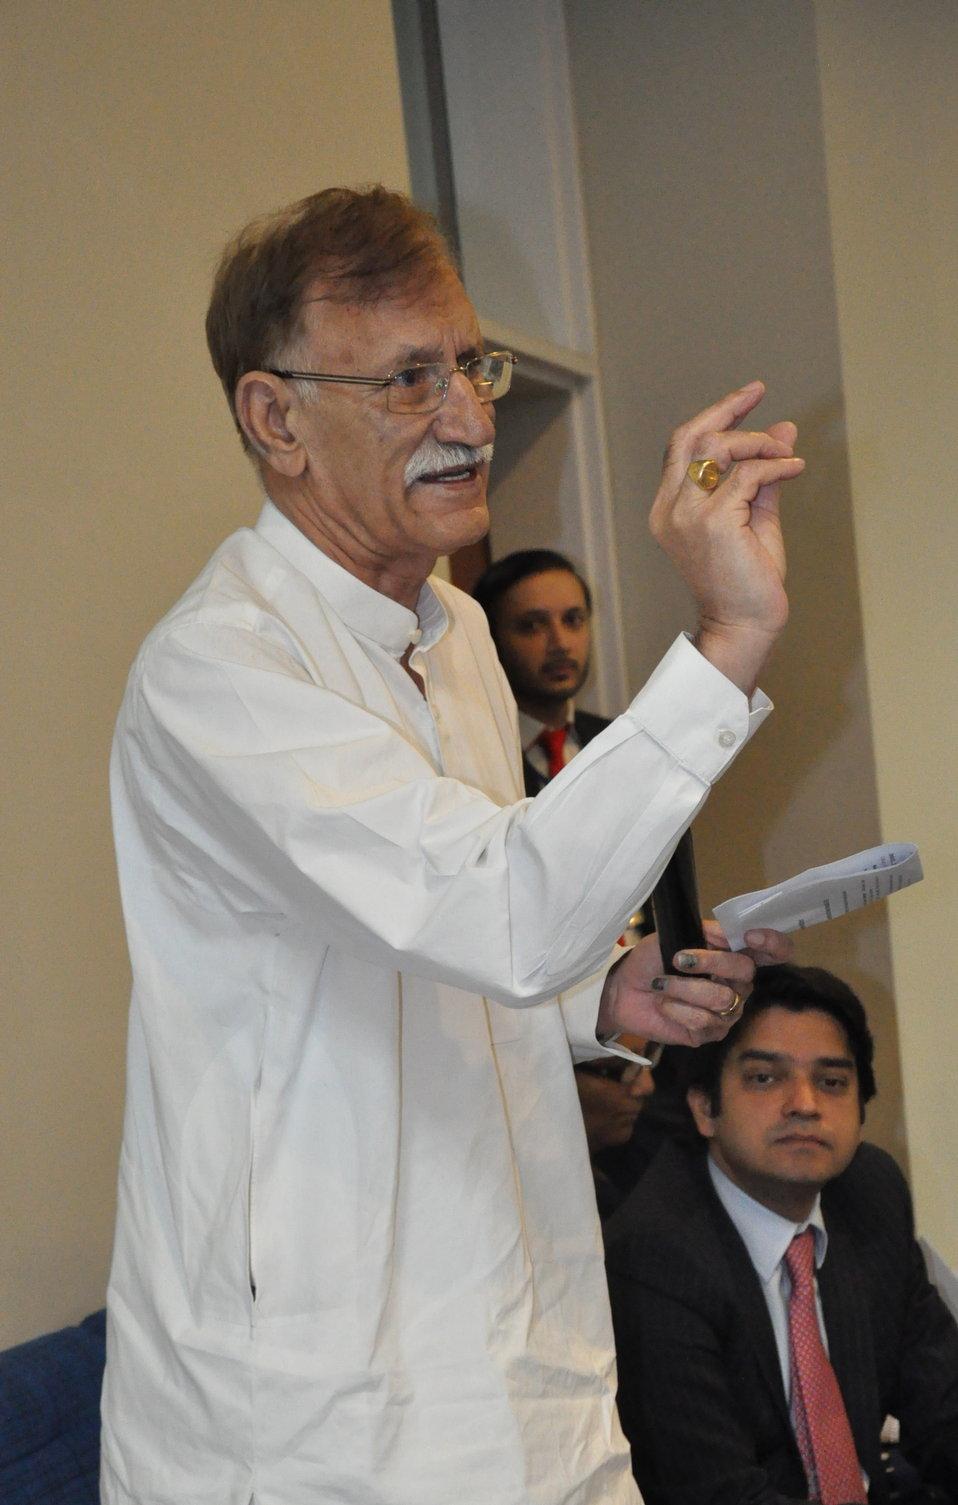 Chairman Punjab Education Foundation Raja Anwar during the QandA session